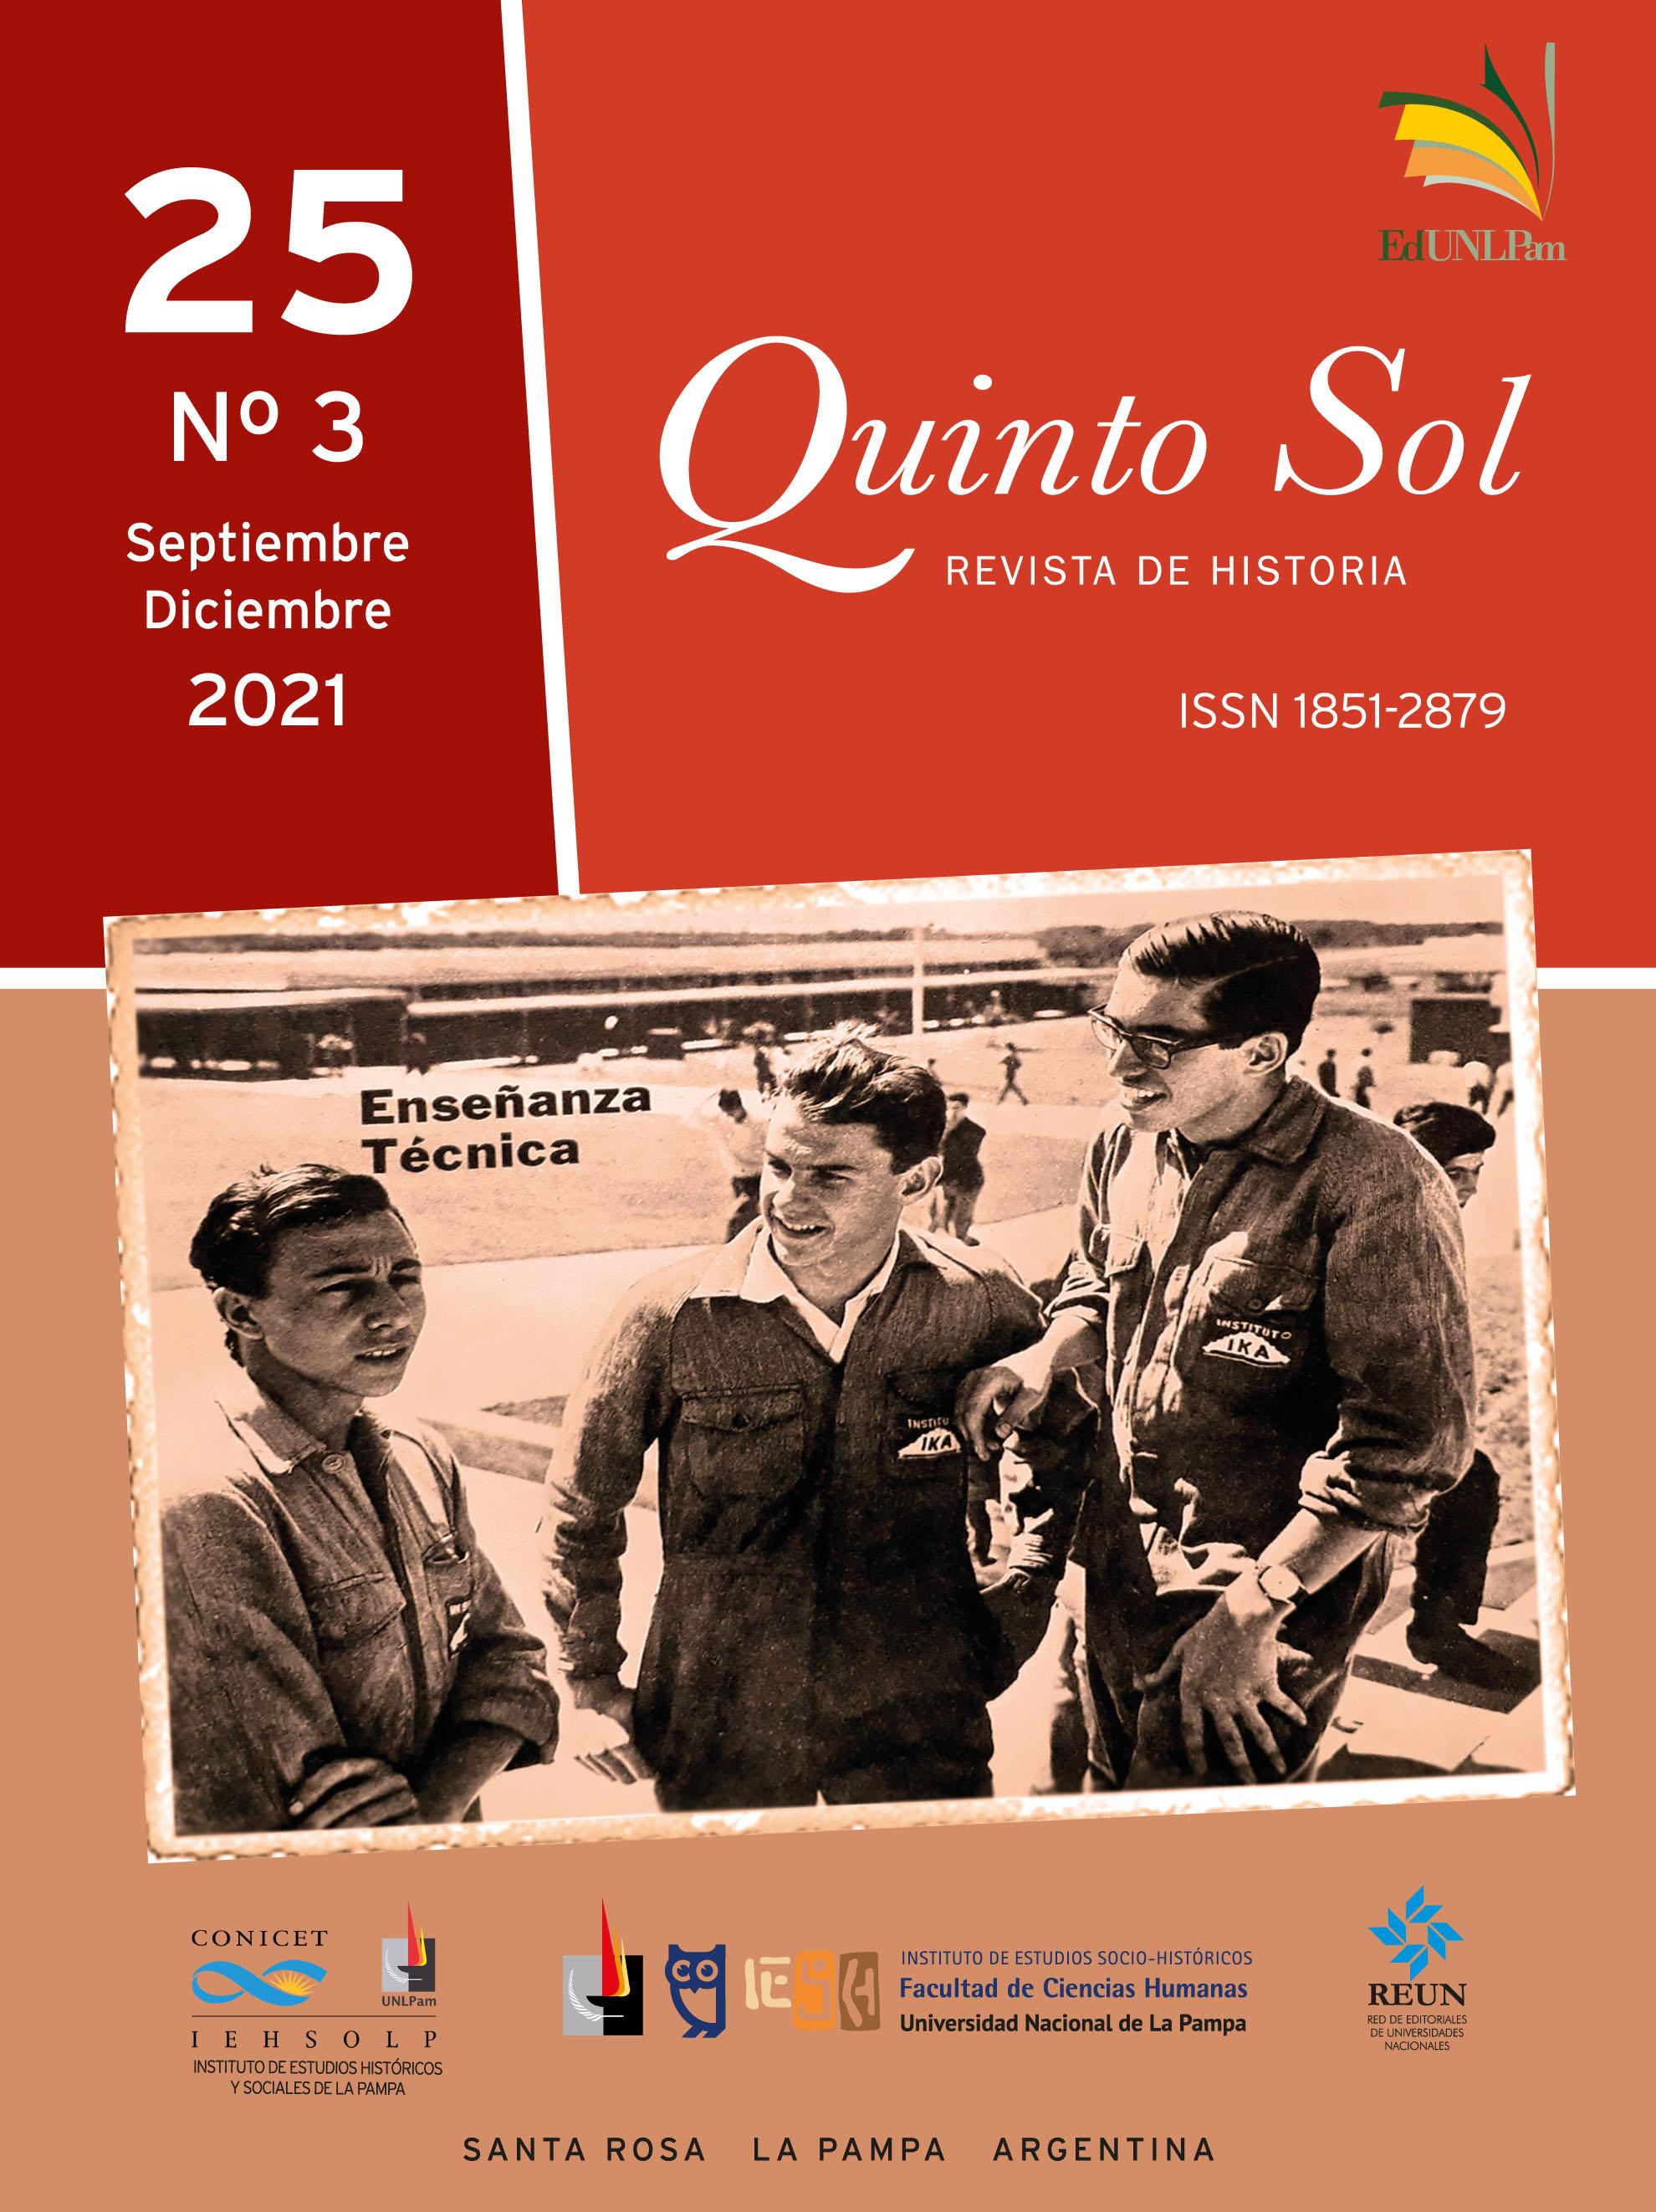 Fotografía de tapa: Enseñanza técnica, julio-agosto de 1964, Gacetika 71, p. 33. Biblioteca Mayor de la Universidad Nacional de Córdoba. Gentileza Paula Romani.